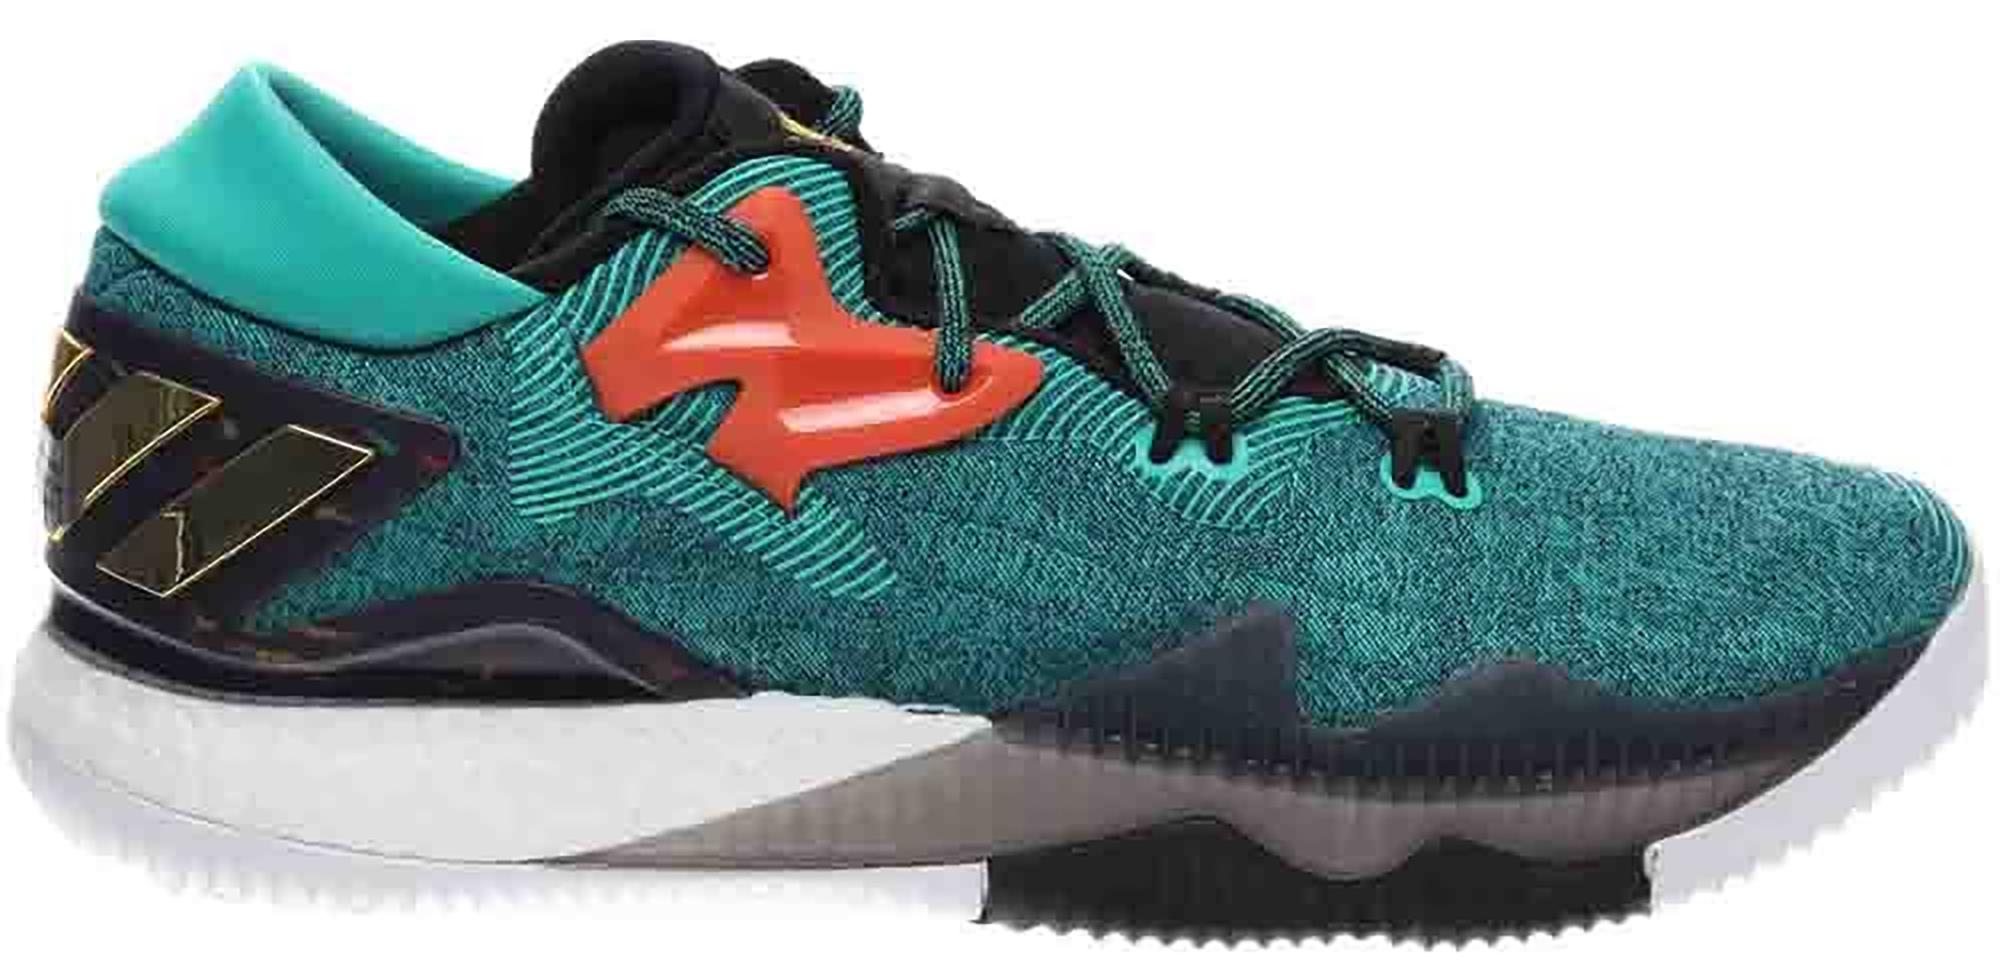 adidas Crazylight Boost 2016 Shock Mint